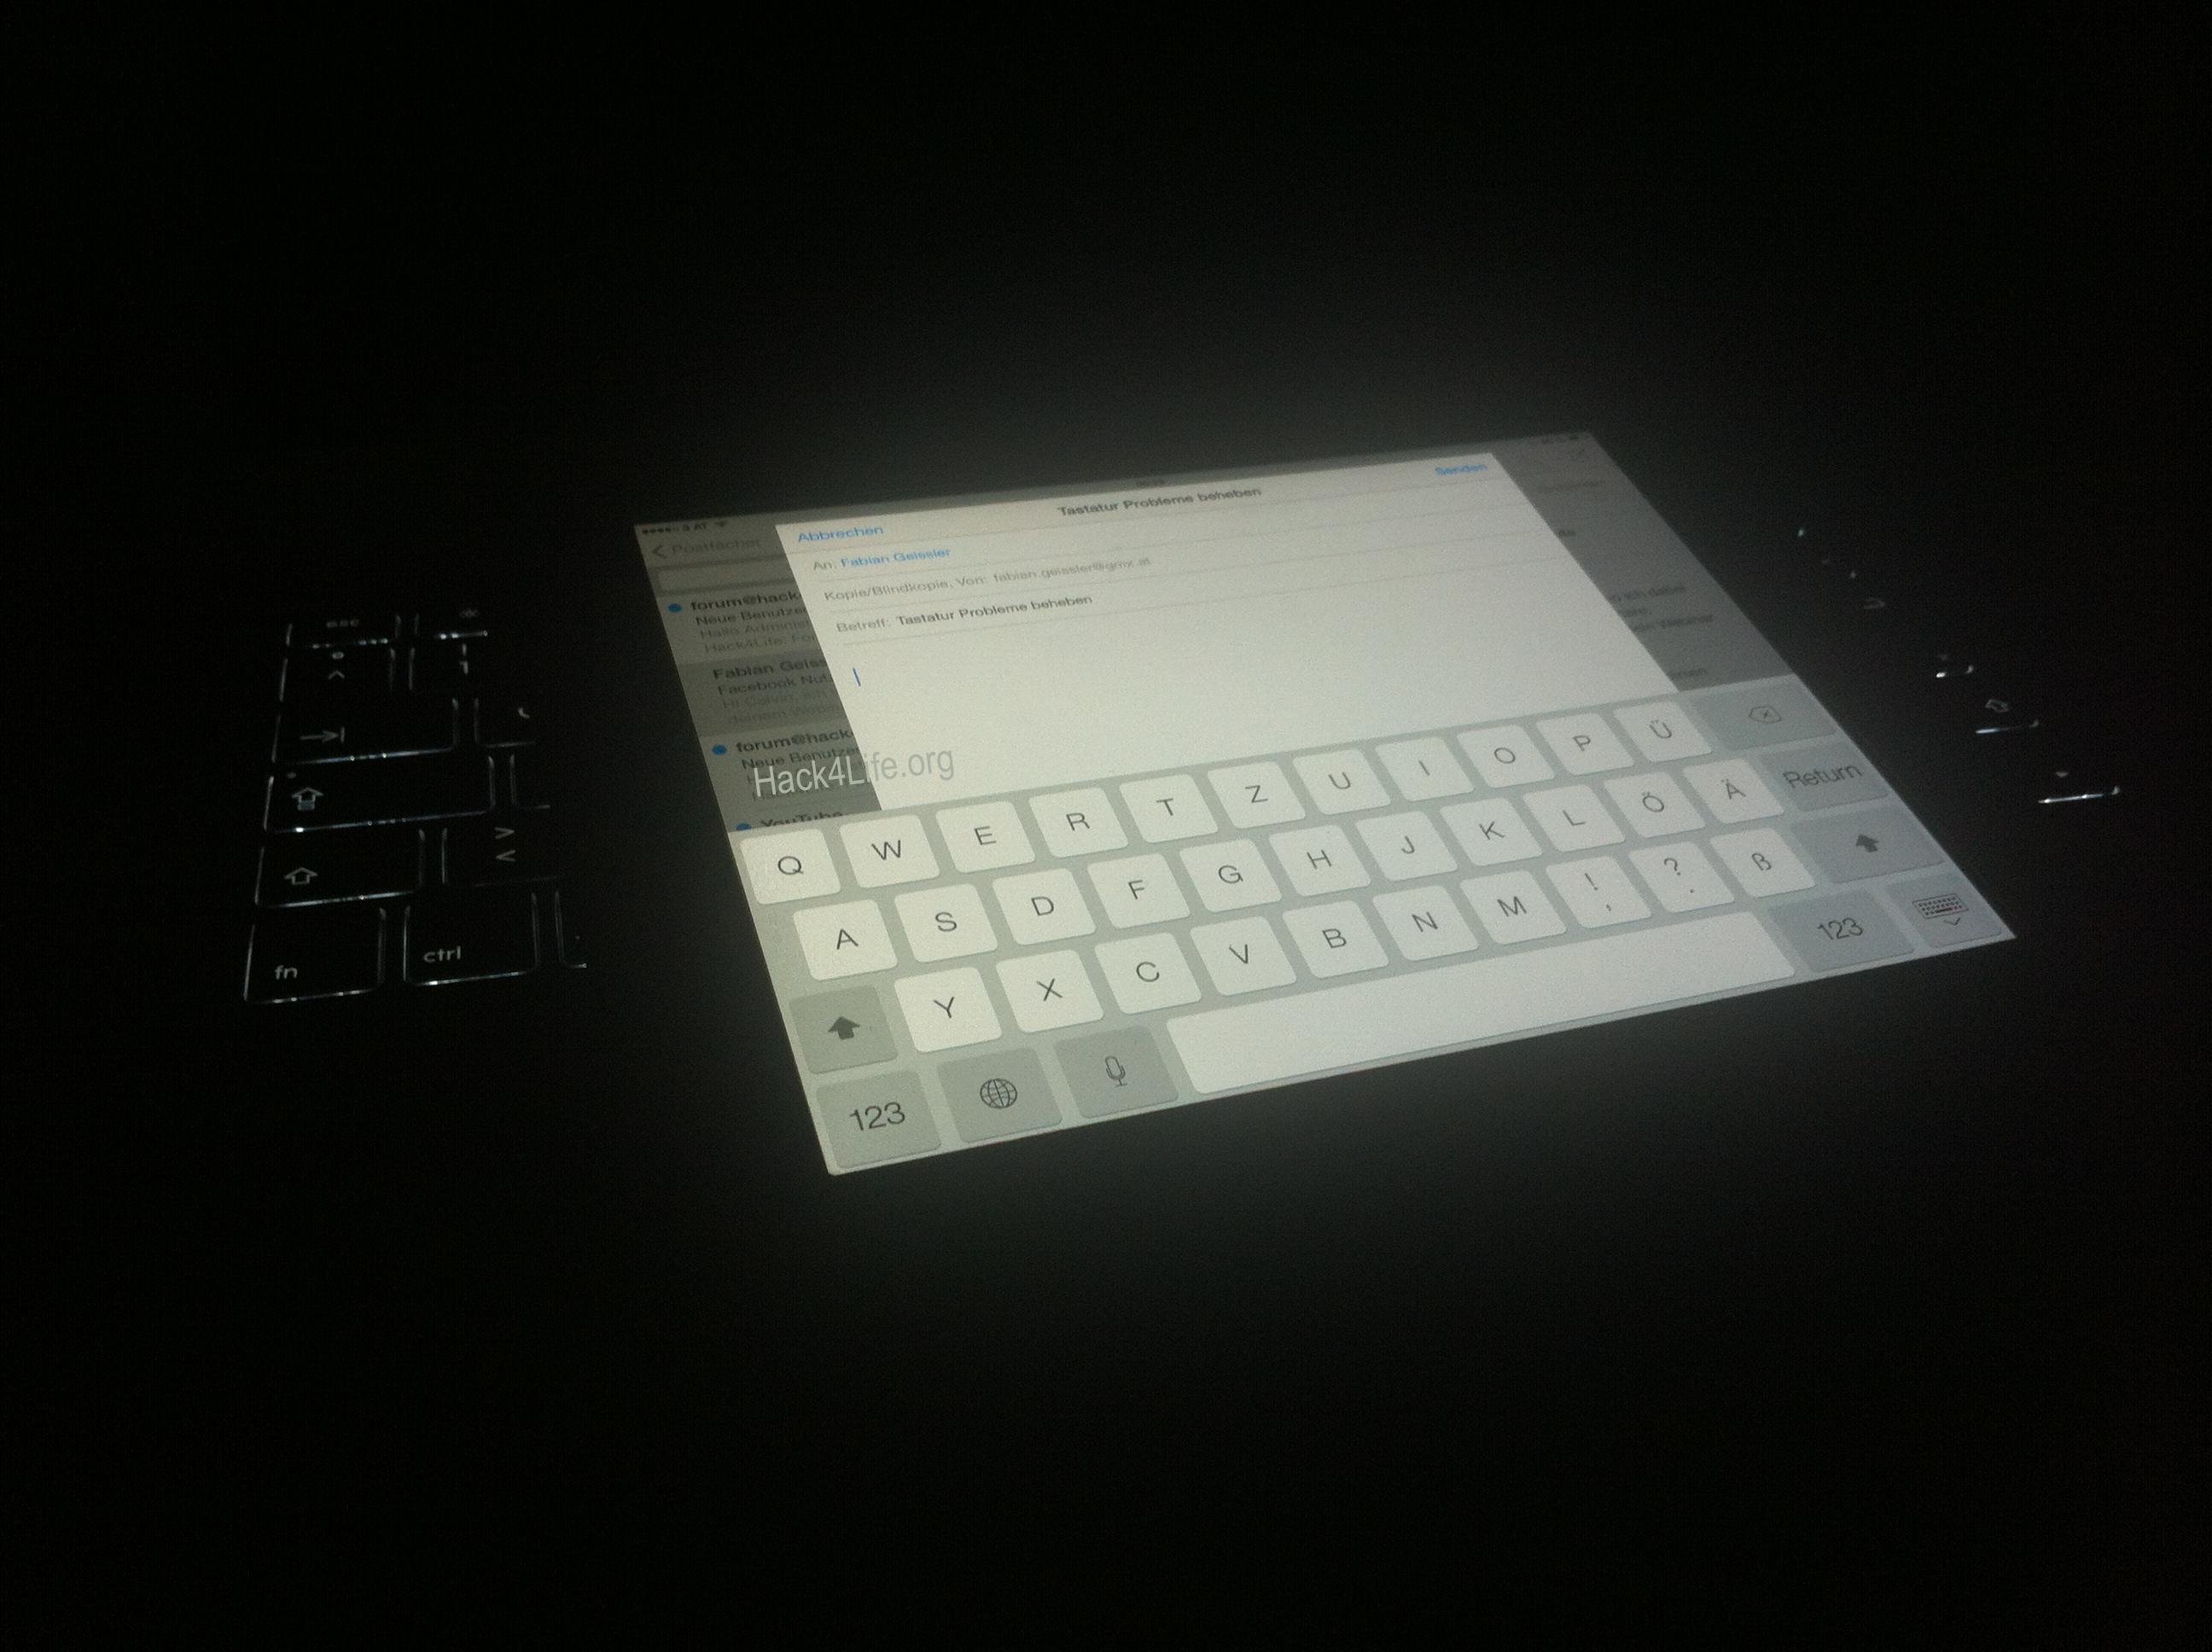 Tastaturprobleme unter iOS 7 beheben - Hack4Life - Anleitung - Keyboard - Tastatur - Bug - Trick - Tipp - How-To